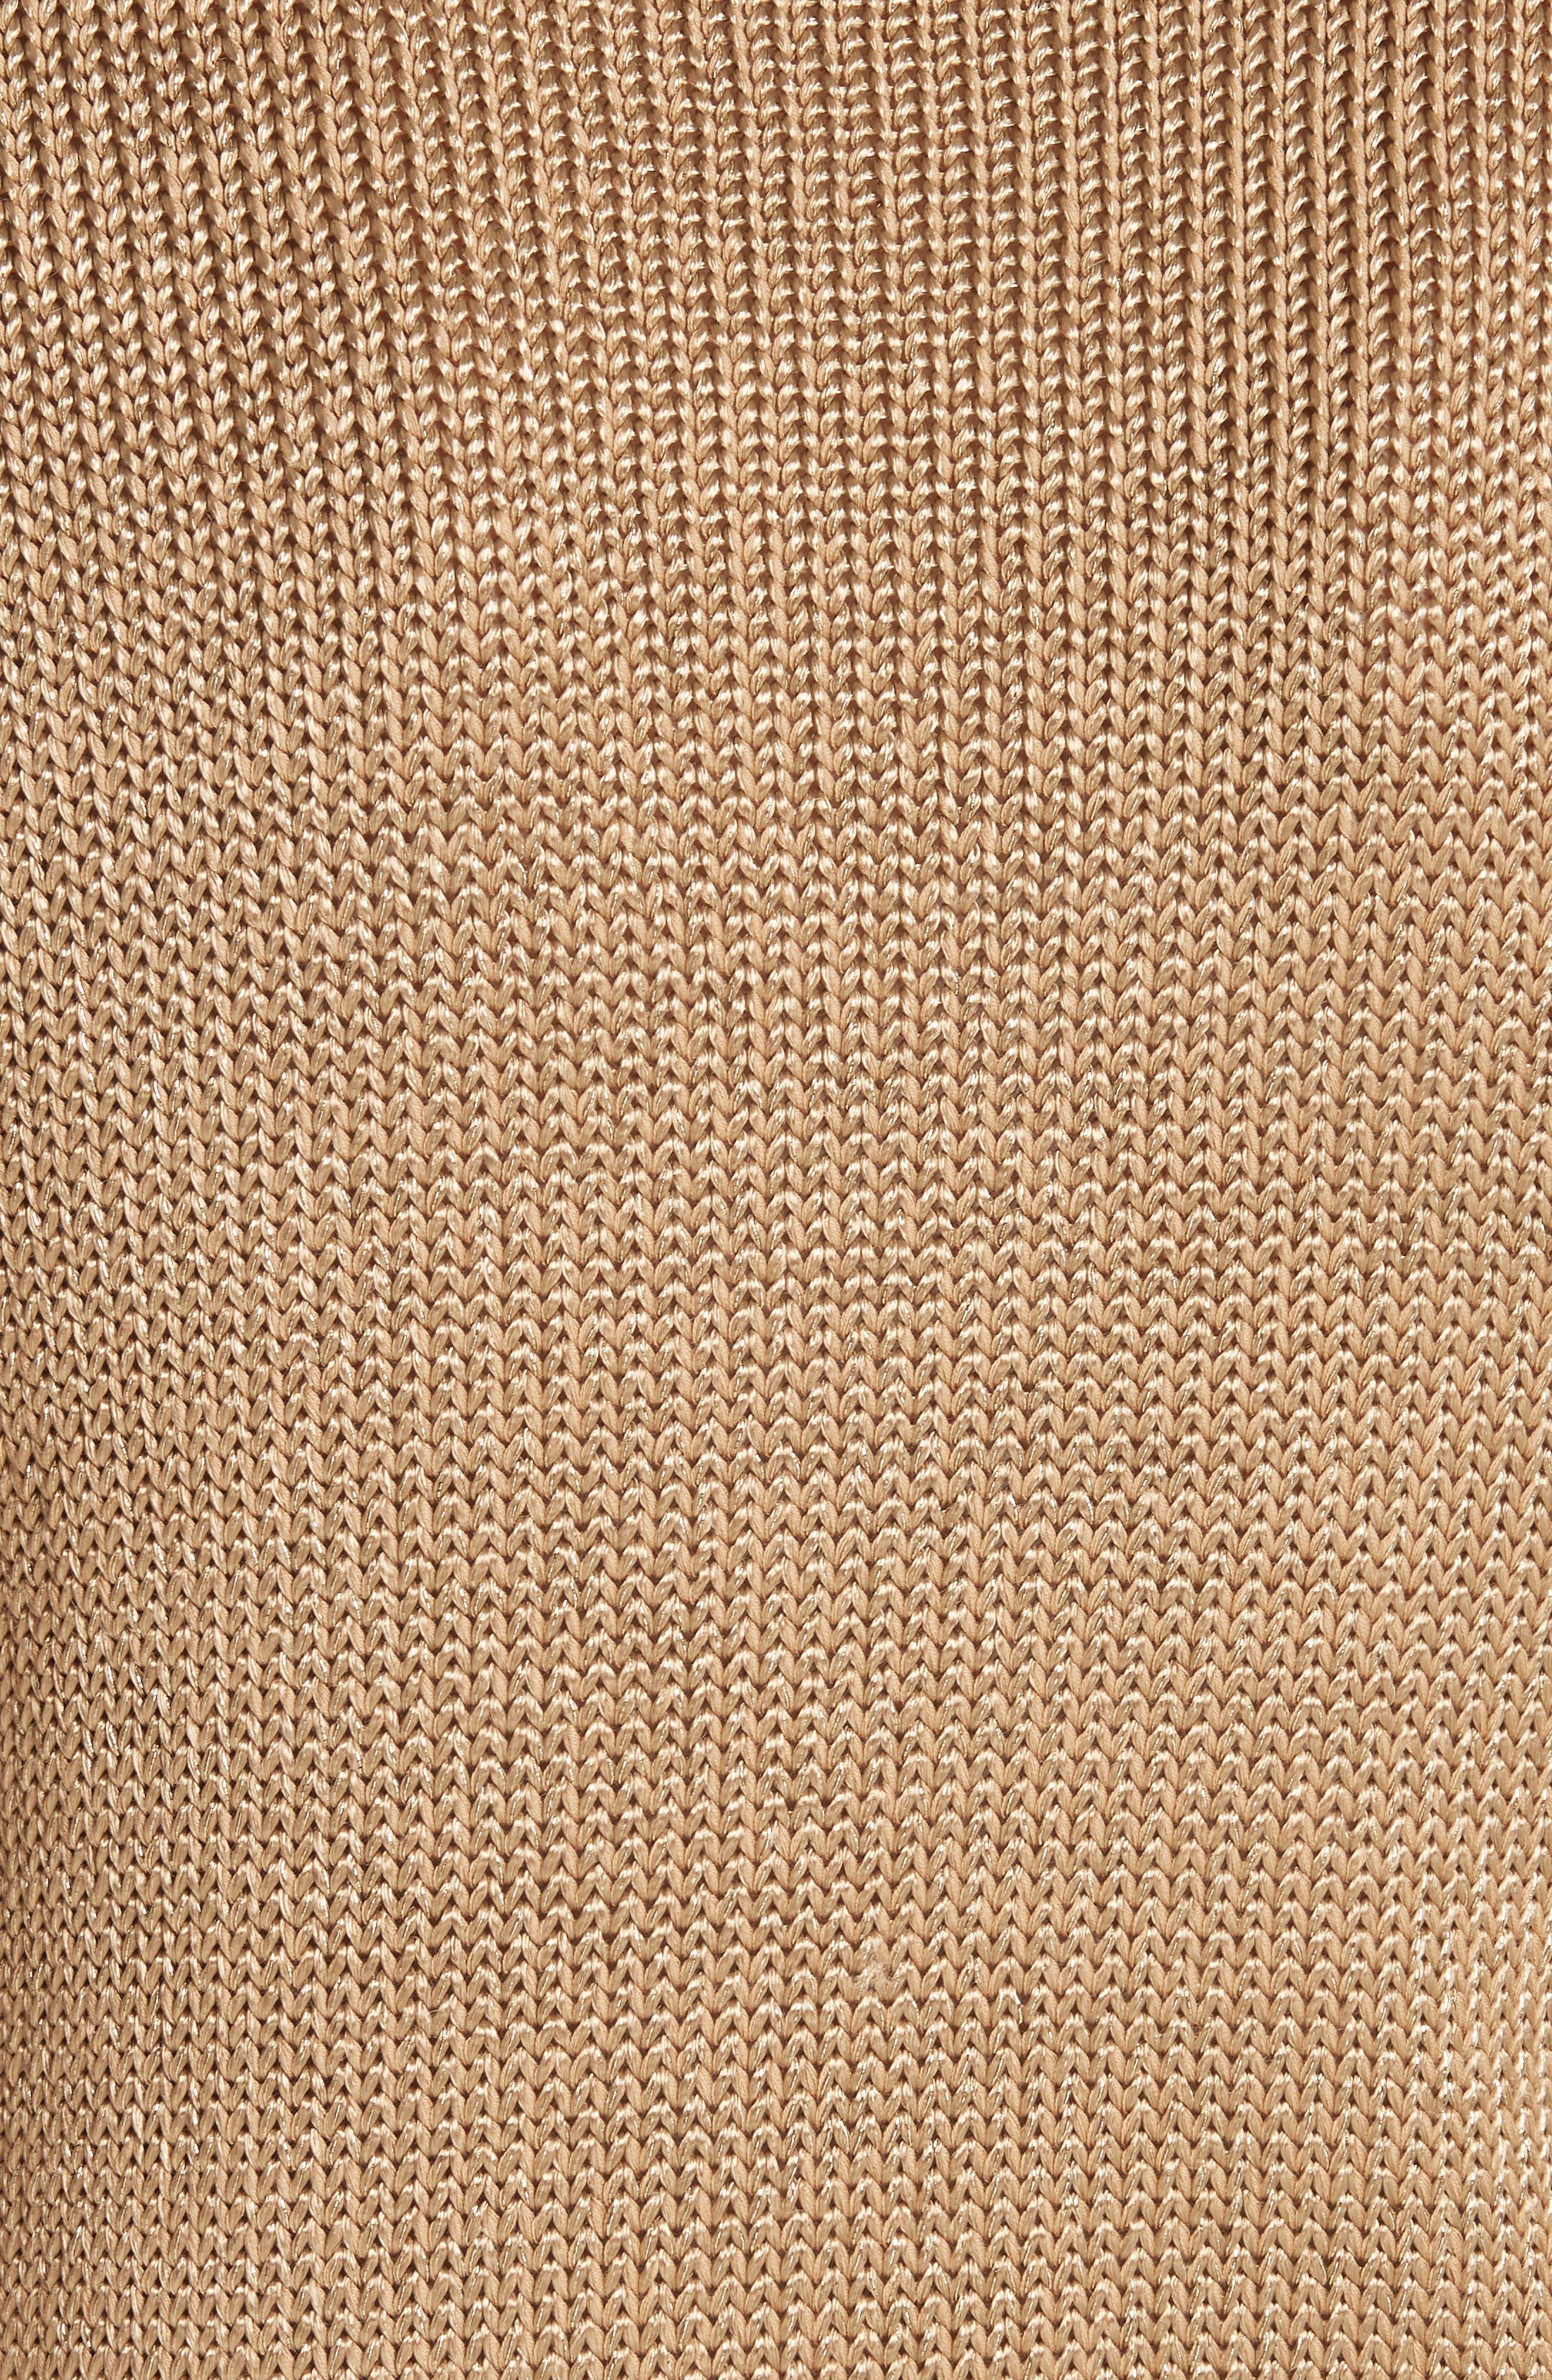 Metallic Cotton Blend Flag Sweater,                             Alternate thumbnail 5, color,                             GOLD MULTI